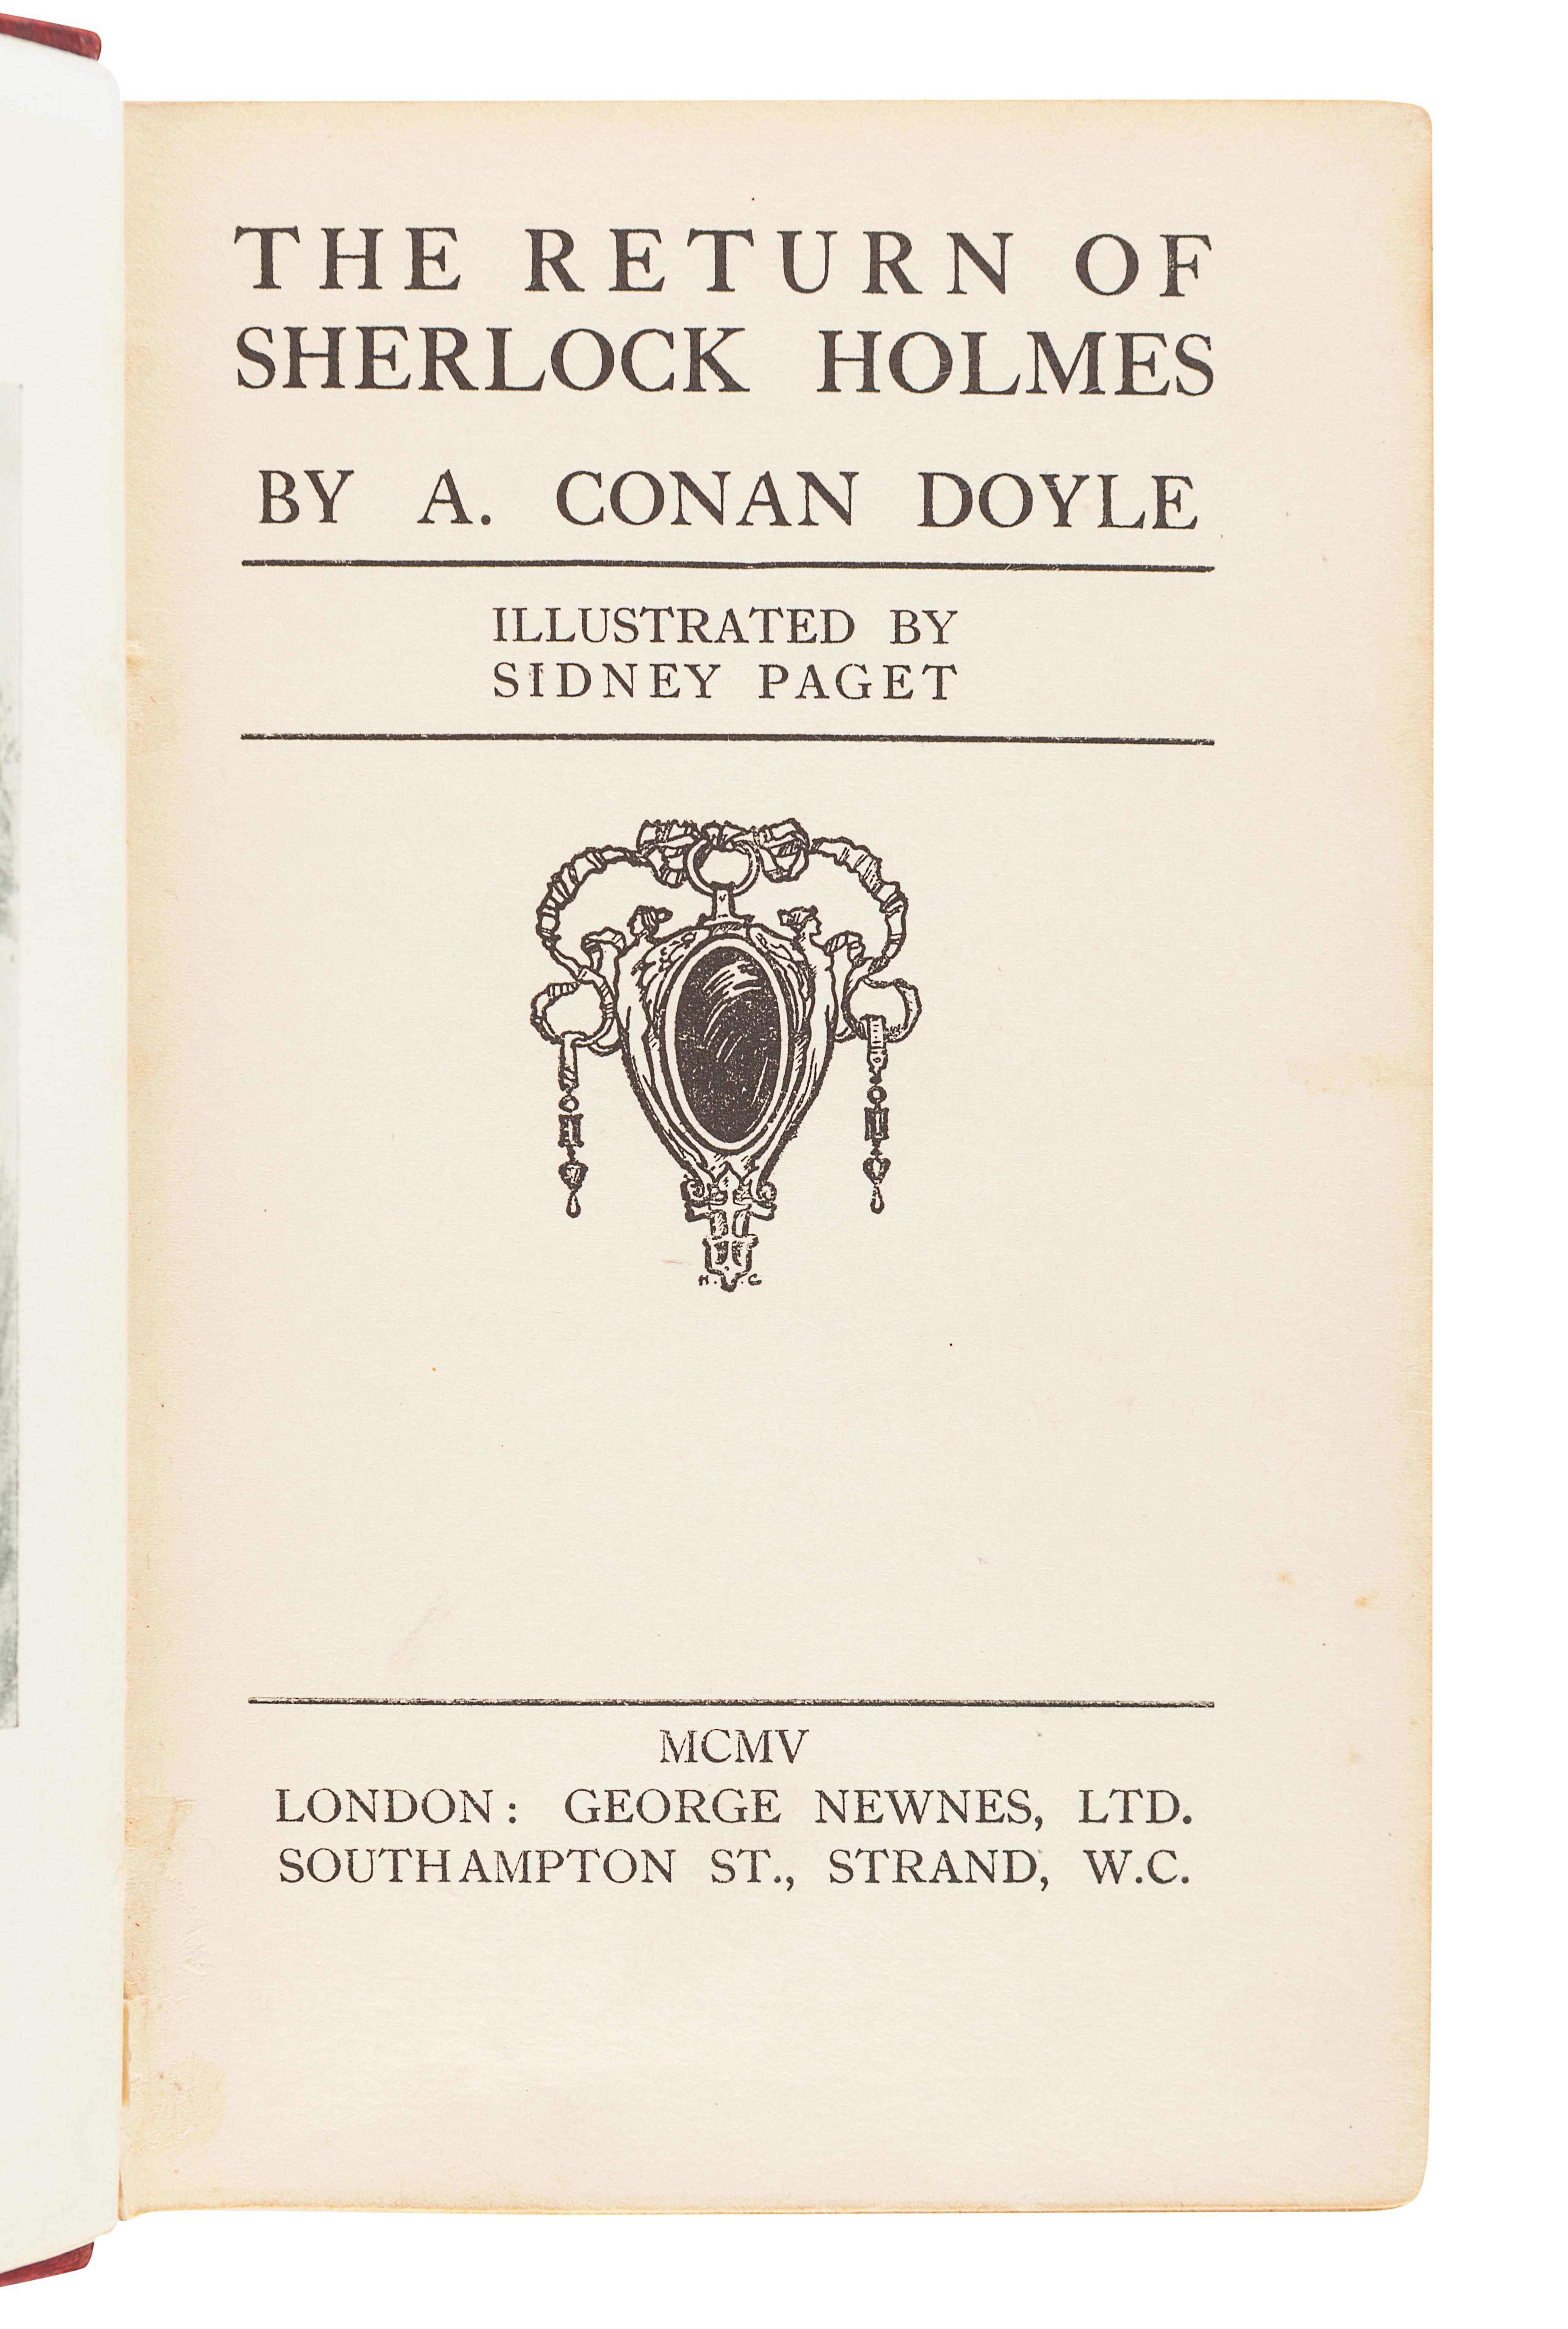 DOYLE, Arthur Conan (1859-1930). The Return of Sherlock Holmes. London: George Newnes Ltd., 1905.